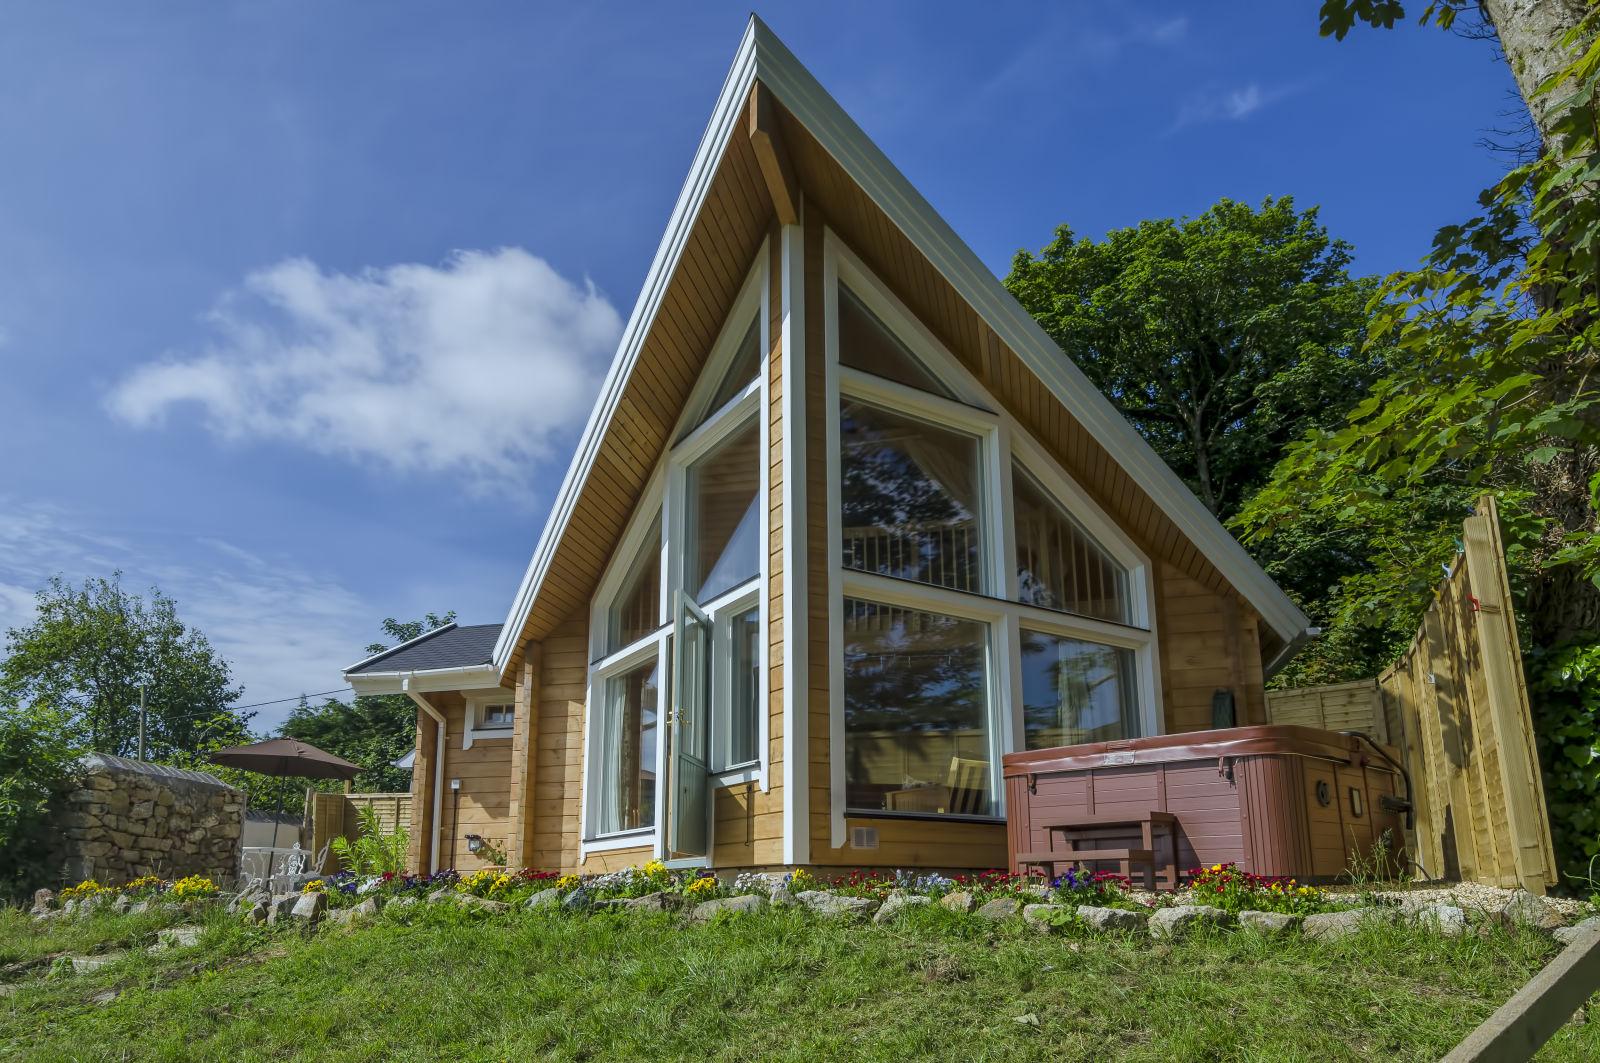 Scandi lodge Cornwall, Stunning Scandinavian Lodge with pool and hot tub, airbnb uk